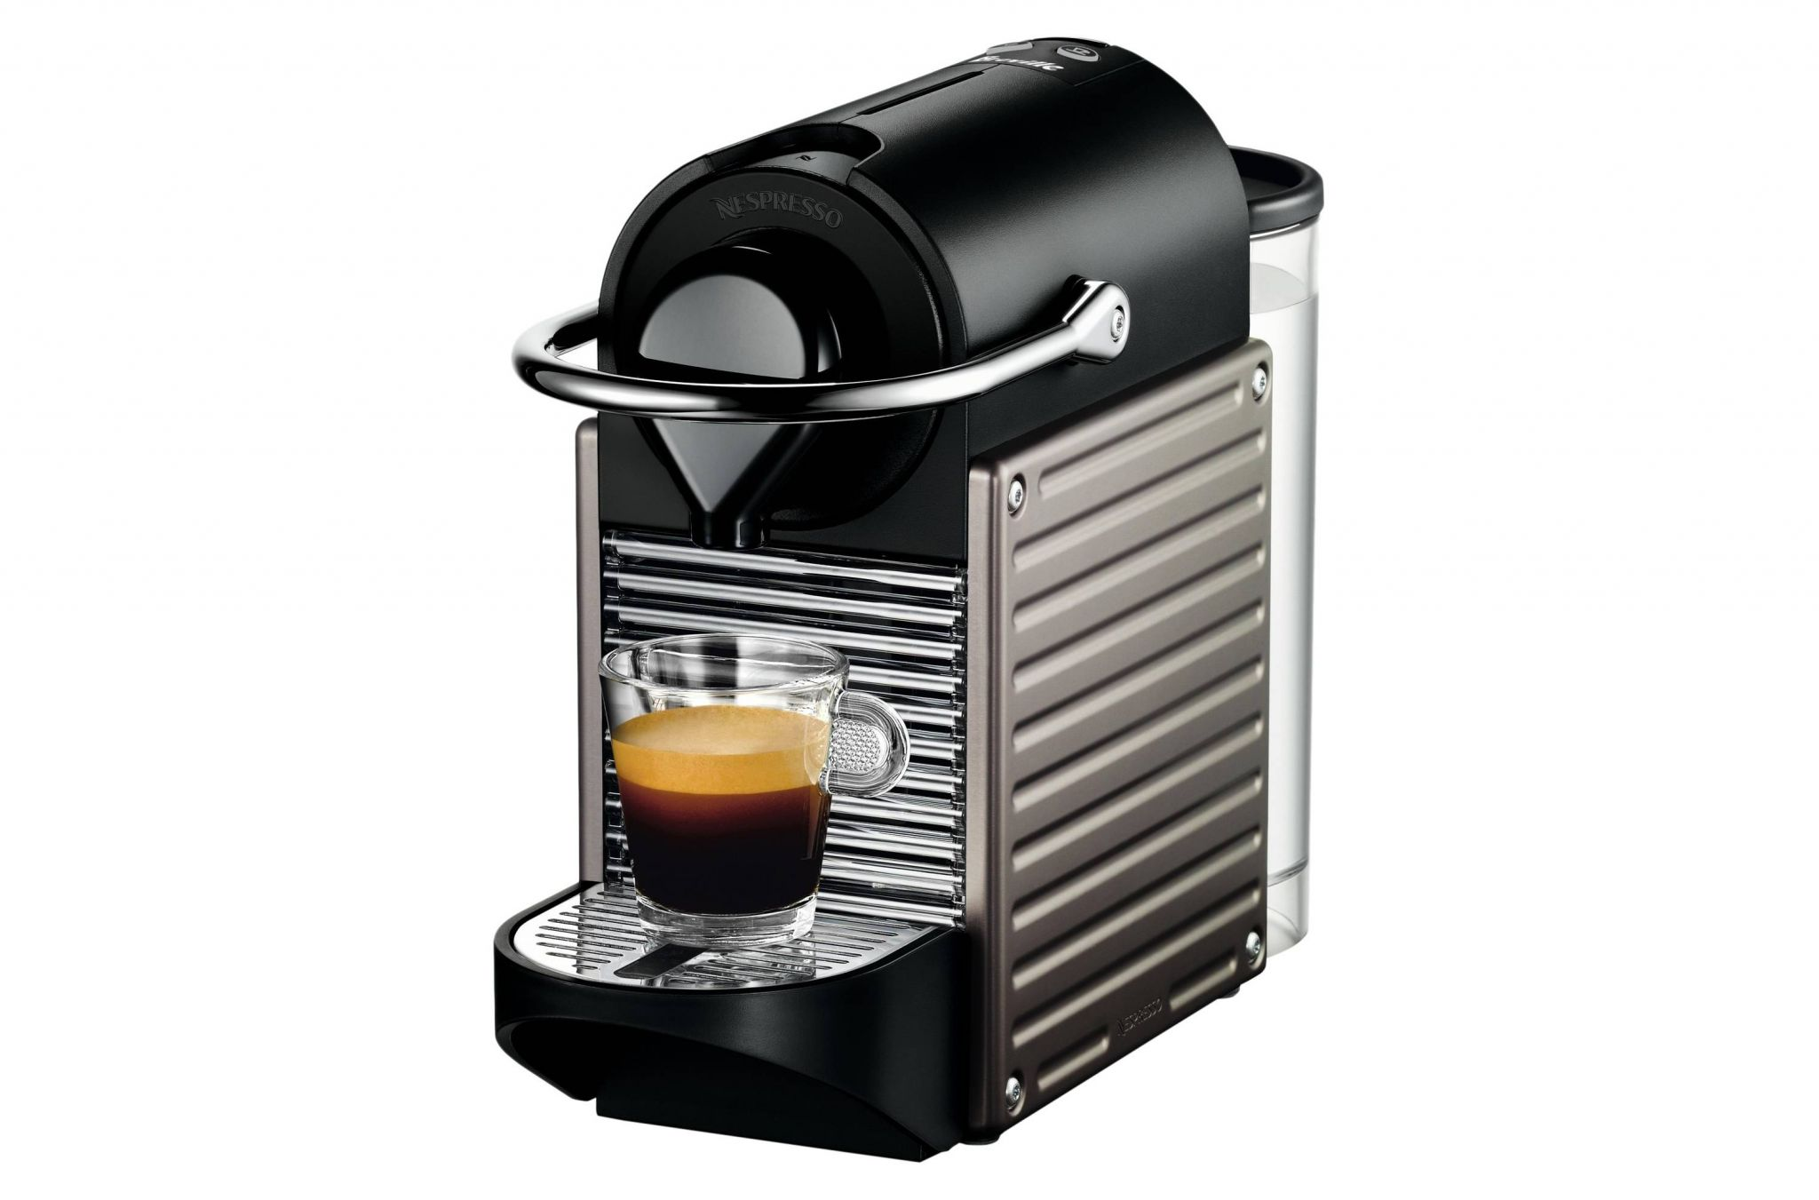 Nespresso Coffee Maker ~ Nespresso coffee maker corinna b s world